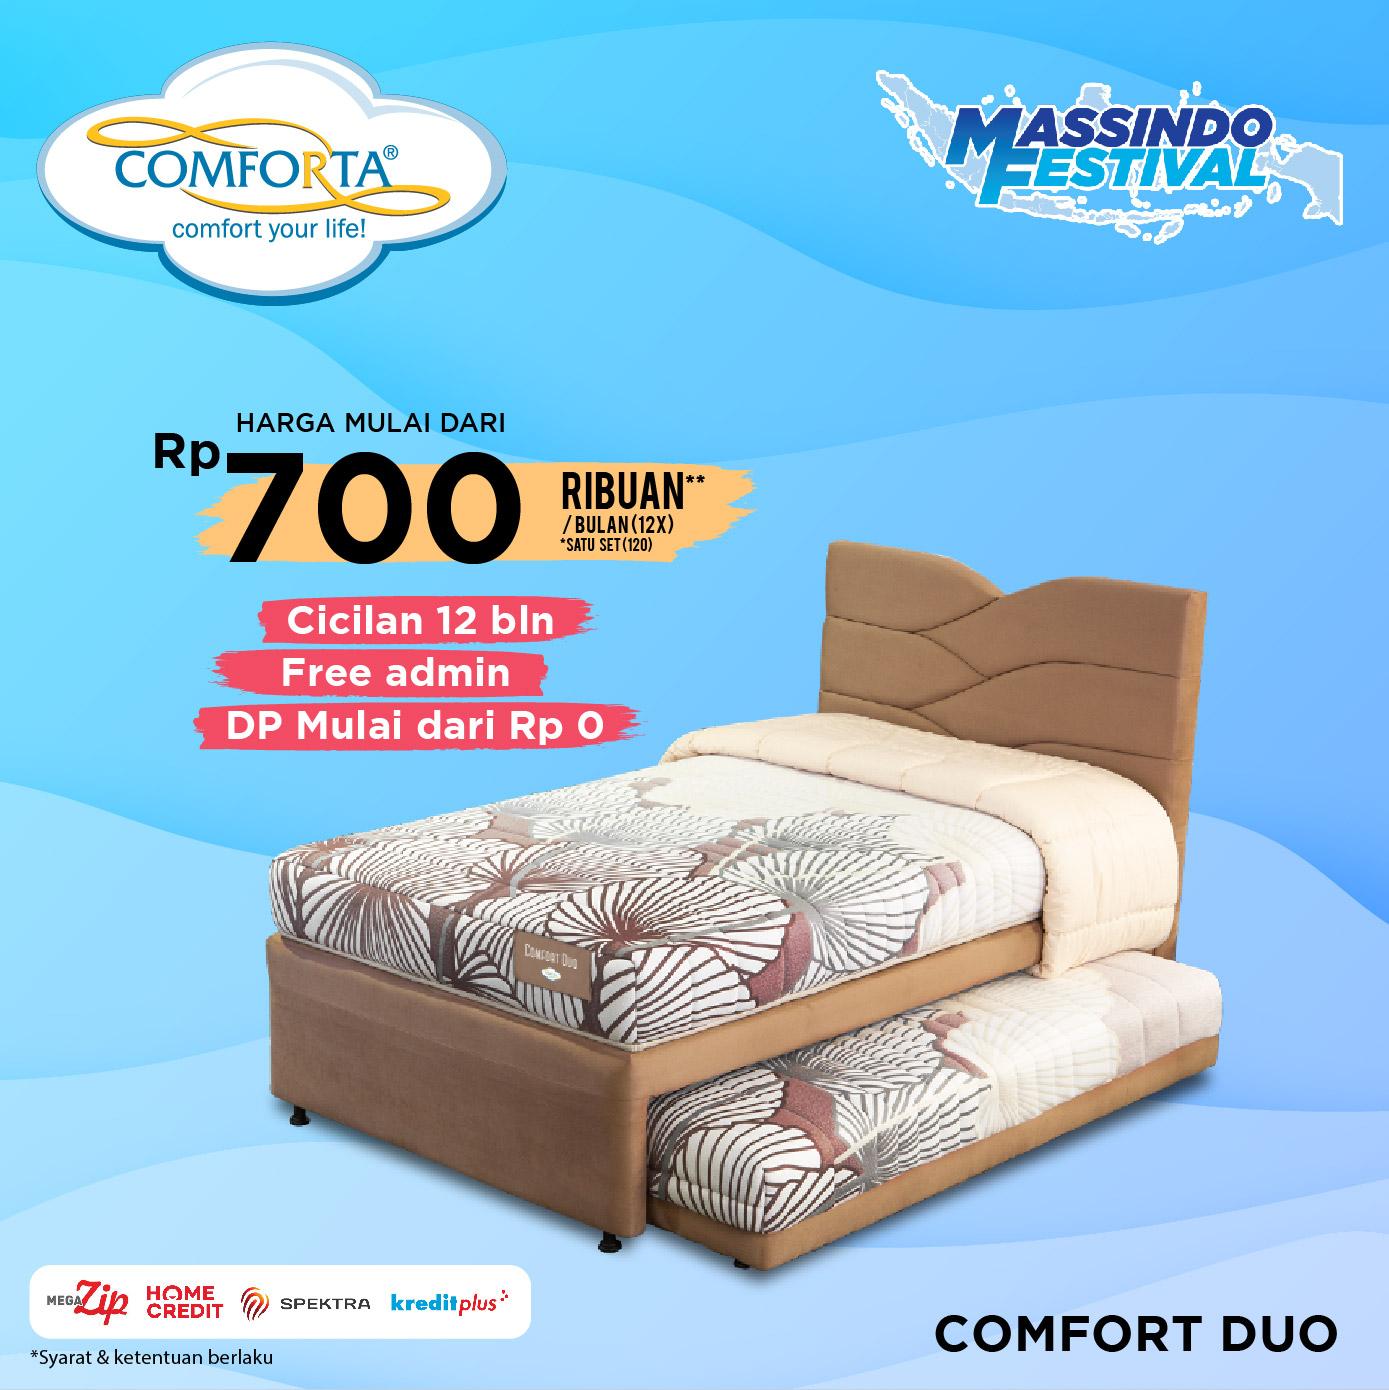 MS FEST_Comfort Duo